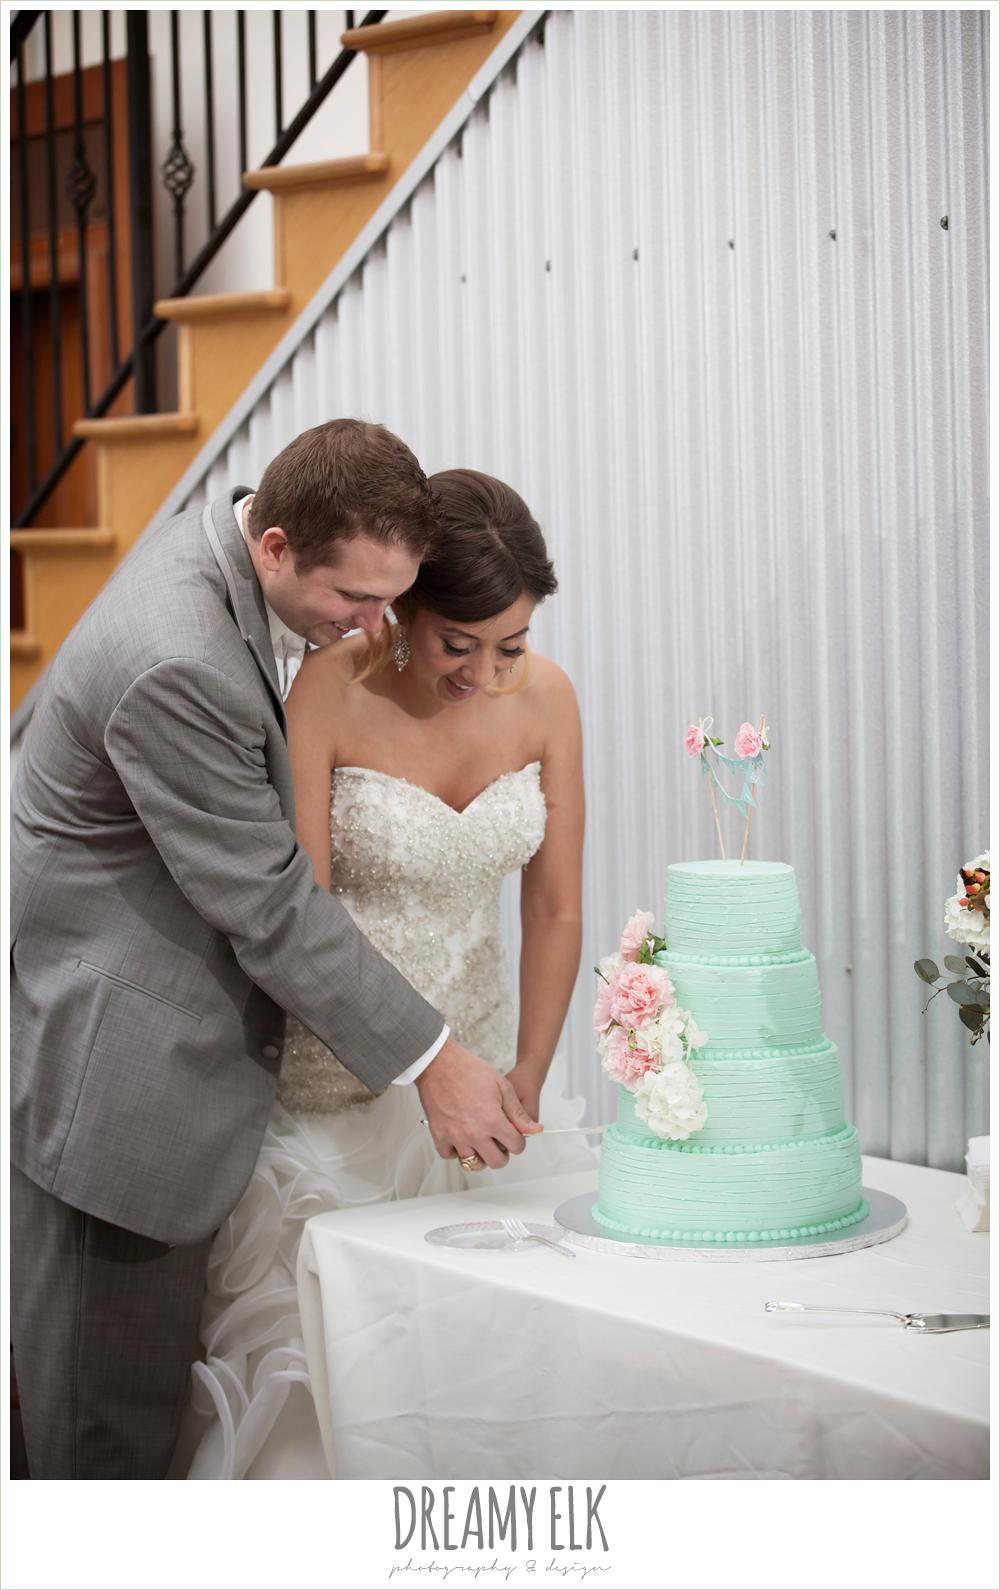 bride and groom cutting the cake, mint green wedding cake, sheila's sweet shoppe, terradorna wedding venue, austin spring wedding {dreamy elk photography and design}